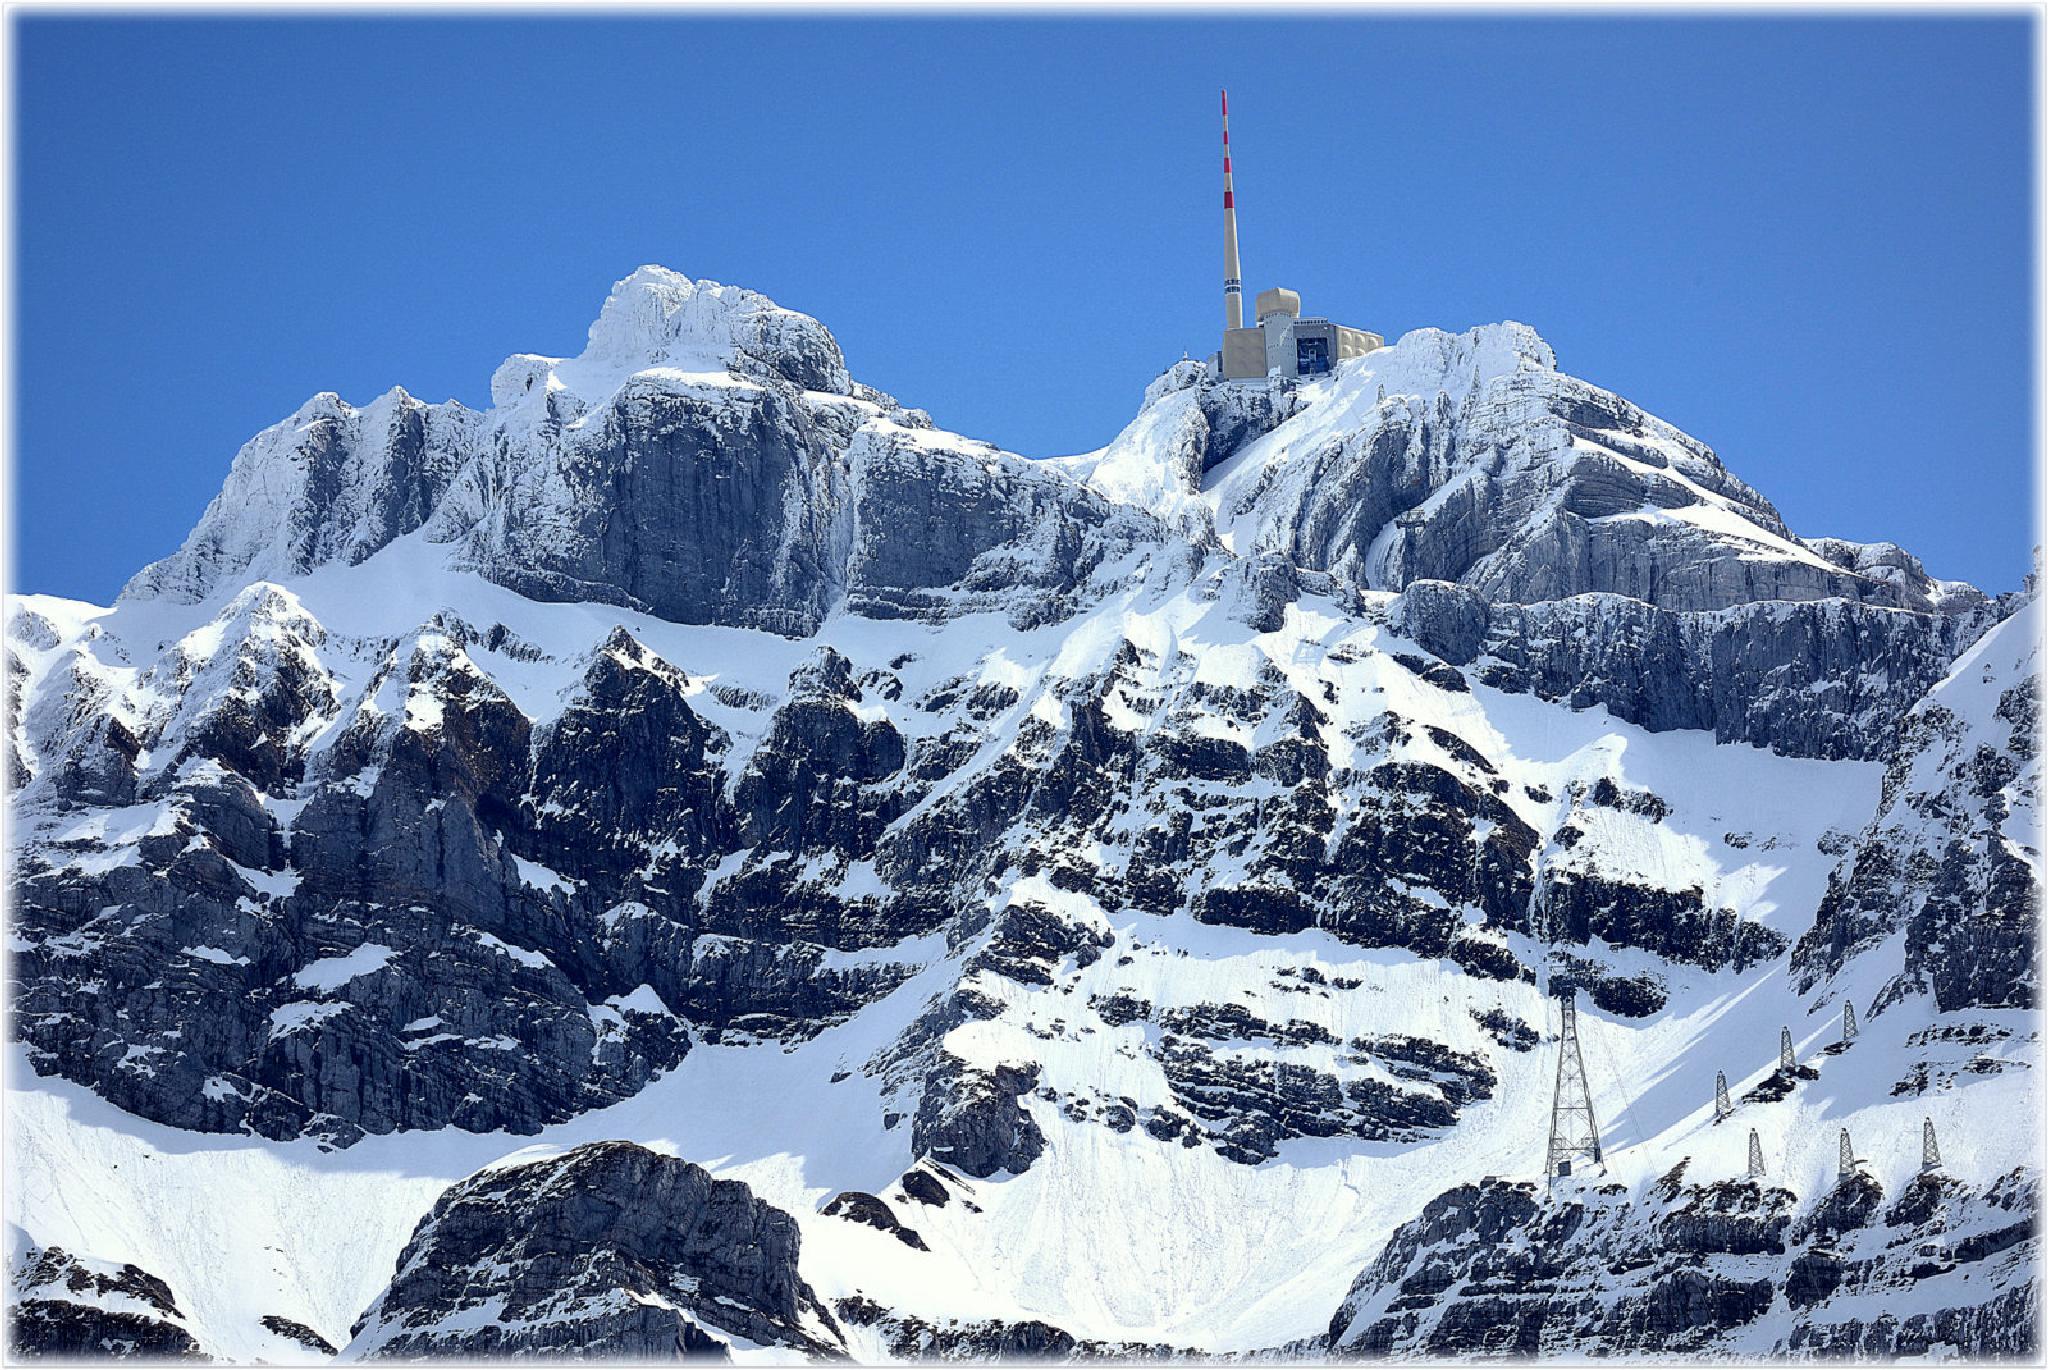 """mountain top 3."" by BauerStefan"